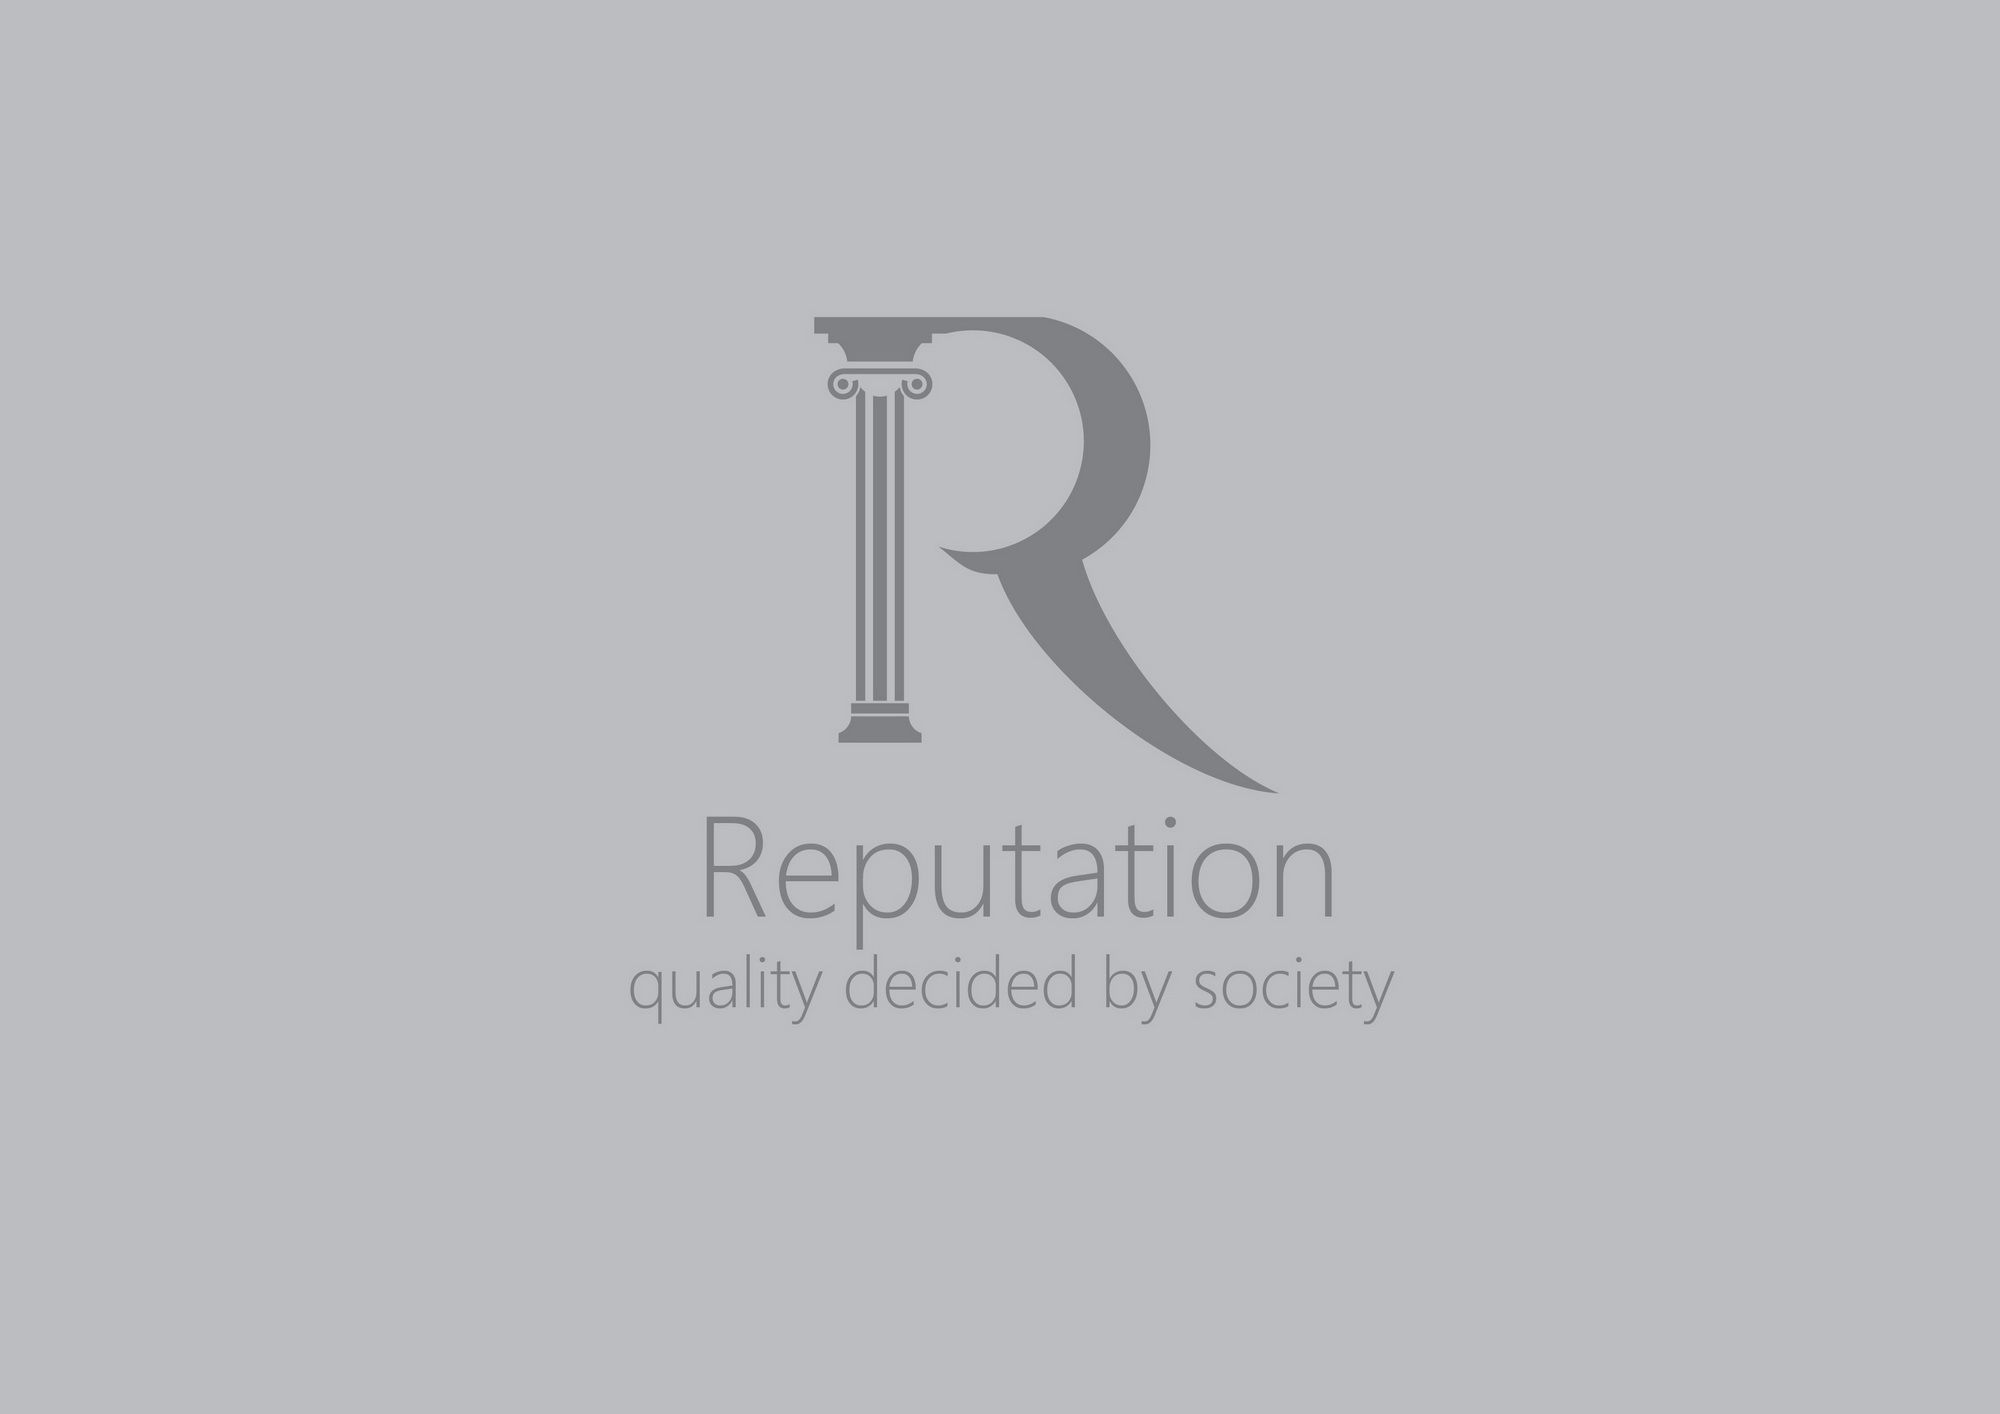 Логотип, визитка и шаблон презентации Reputation - дизайнер kirilln84